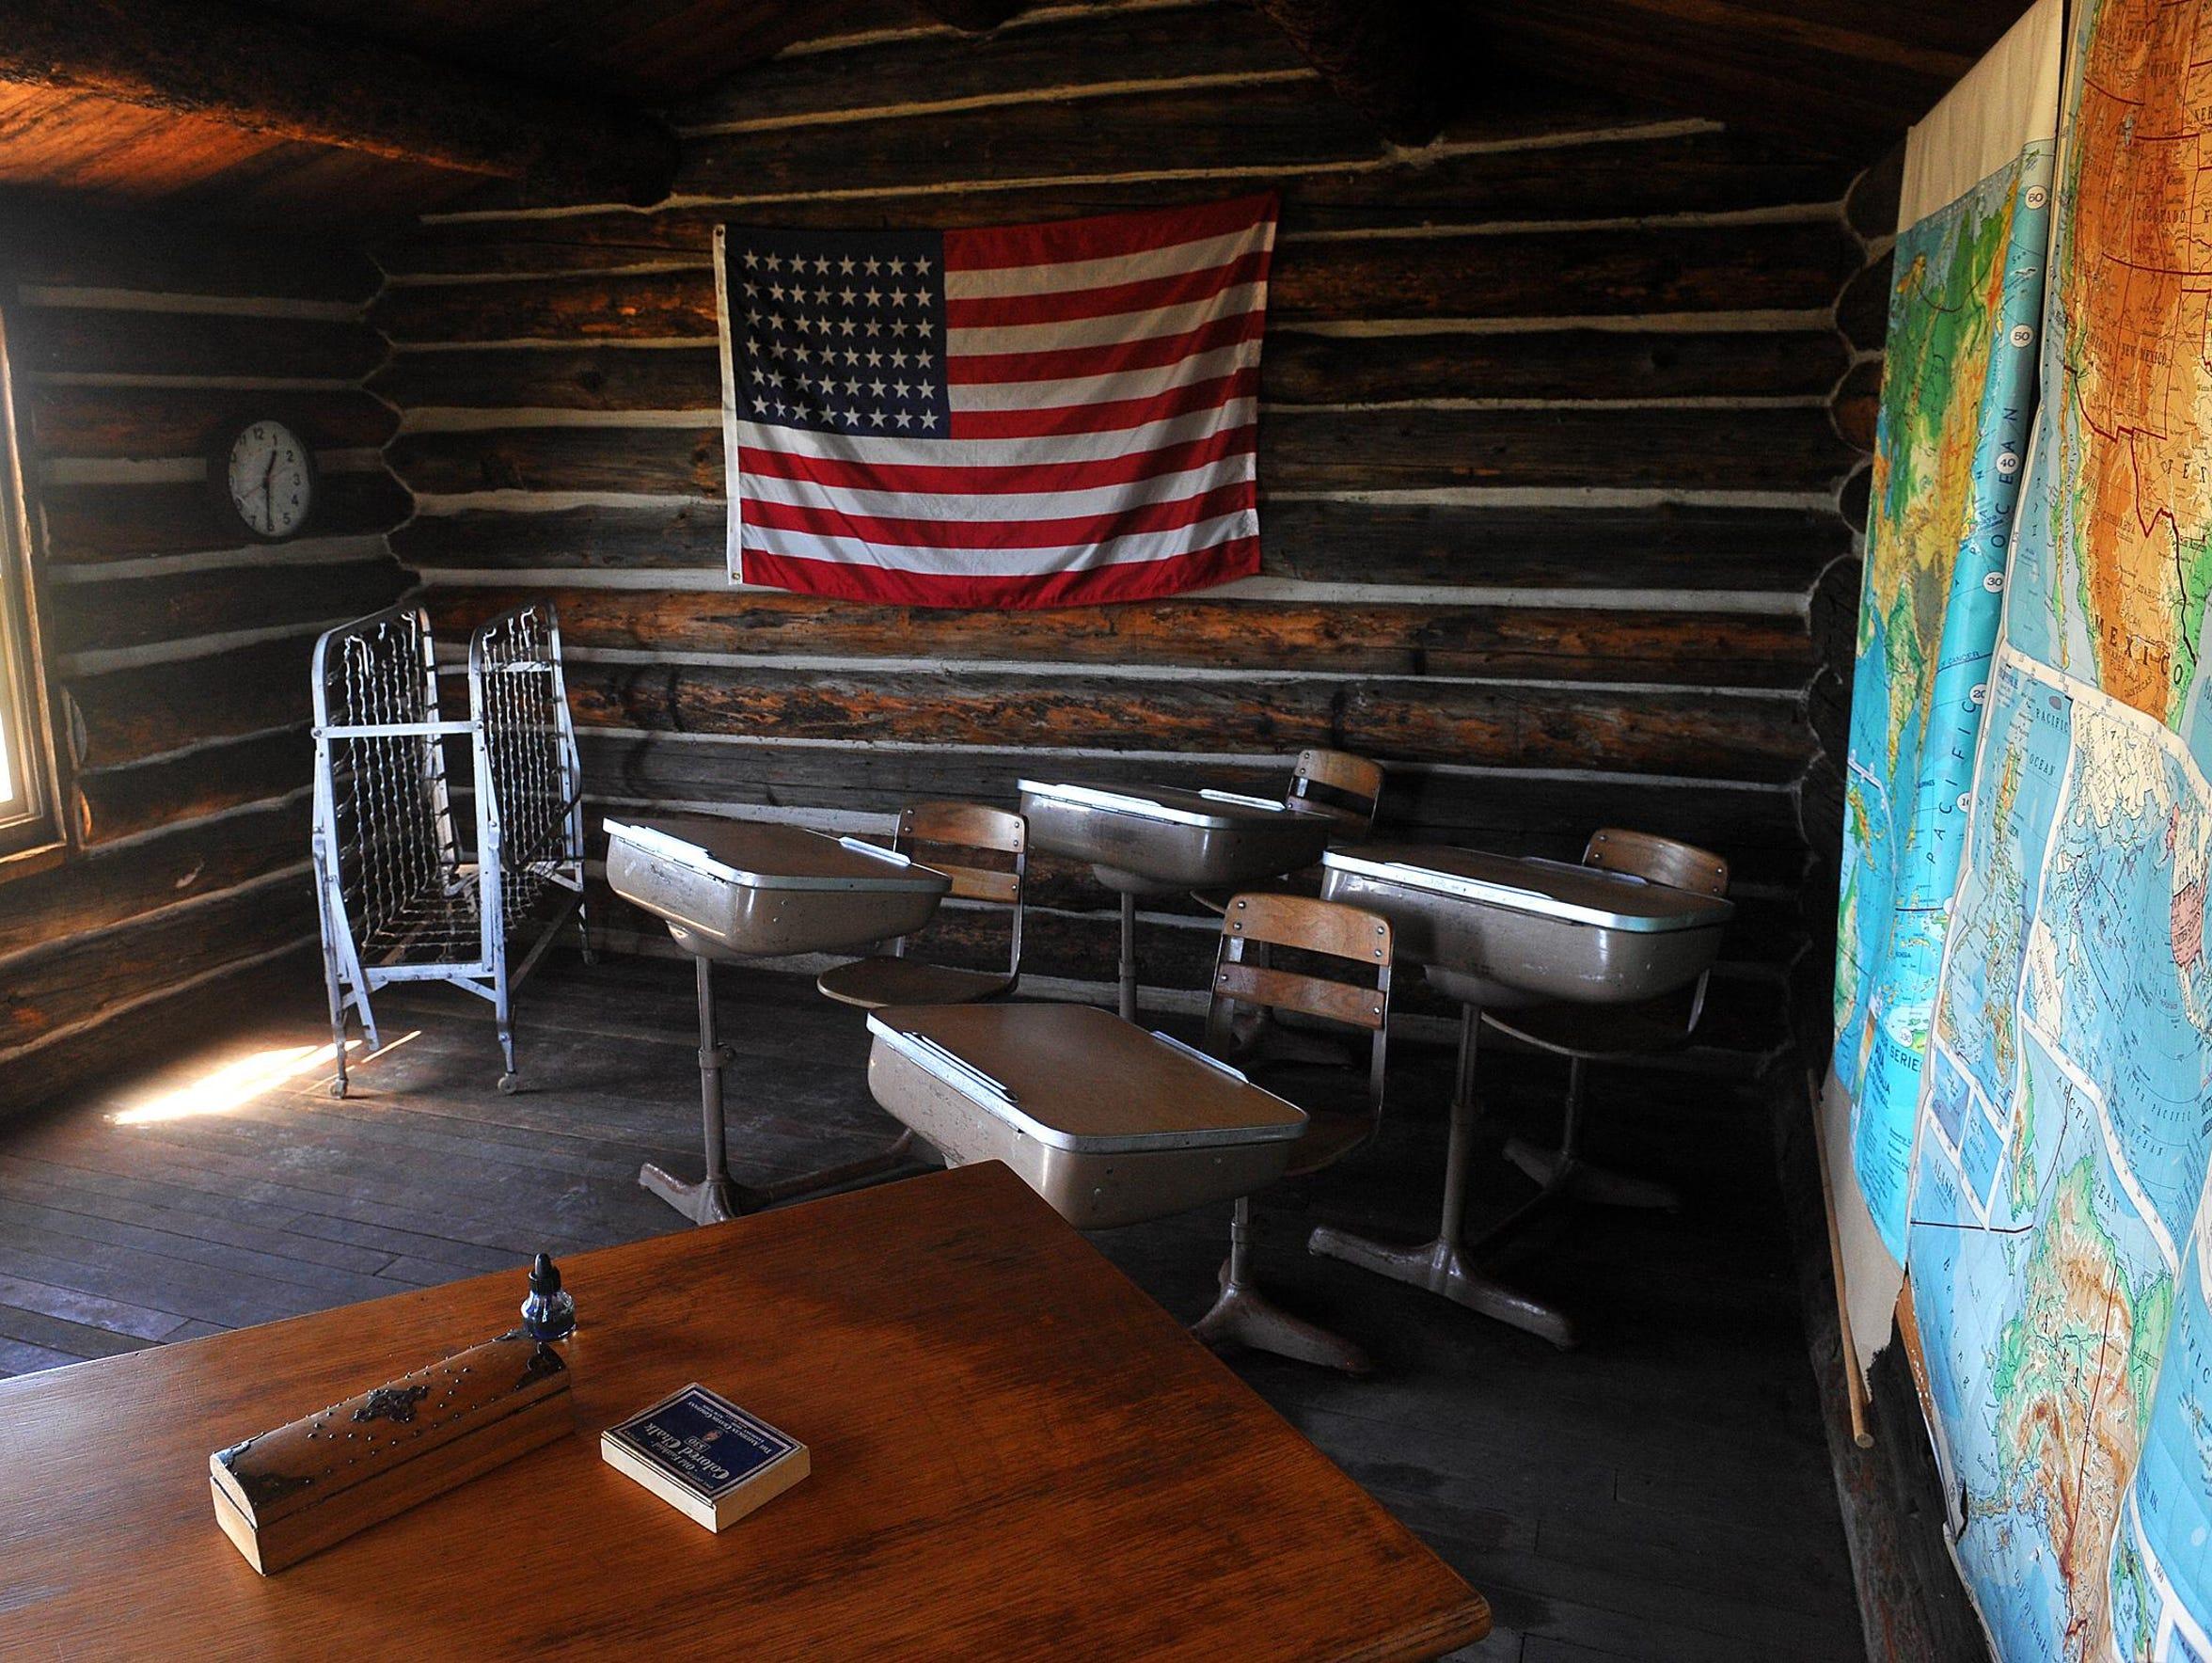 Prairie Union School, a one-room school house on the